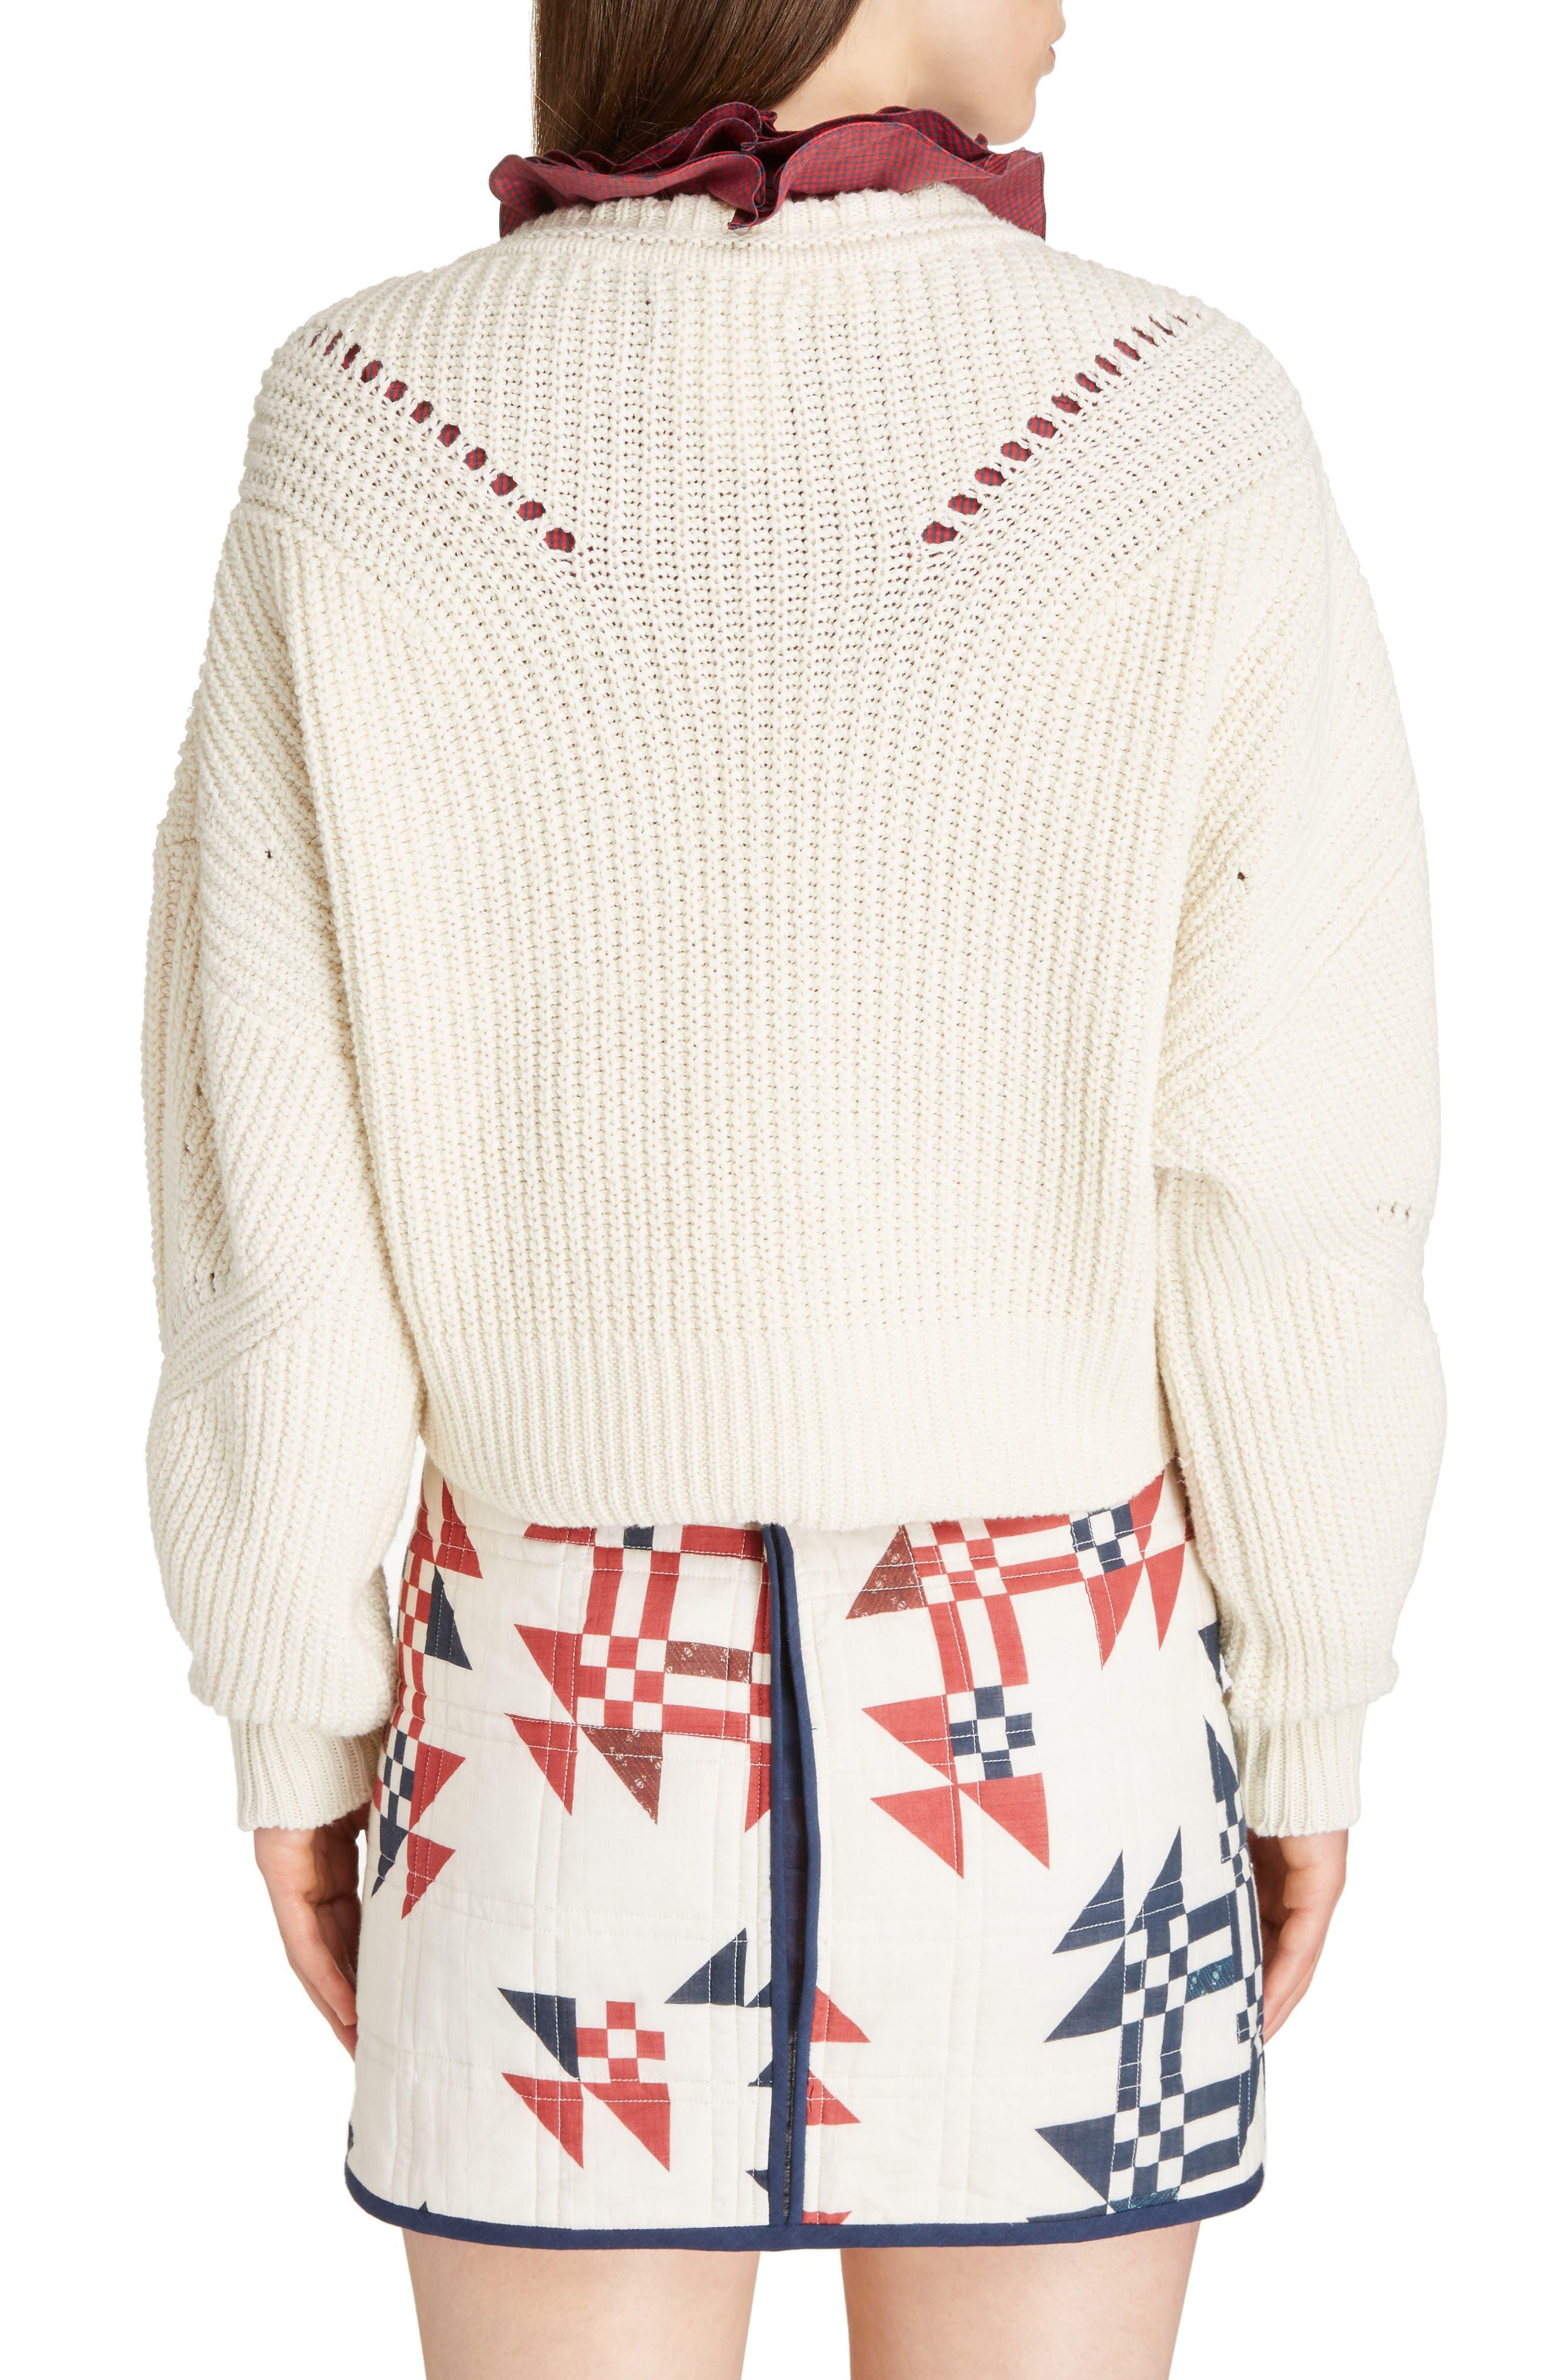 Laley Cotton & Wool Blend Sweater,                             Alternate thumbnail 2, color,                             Ecru